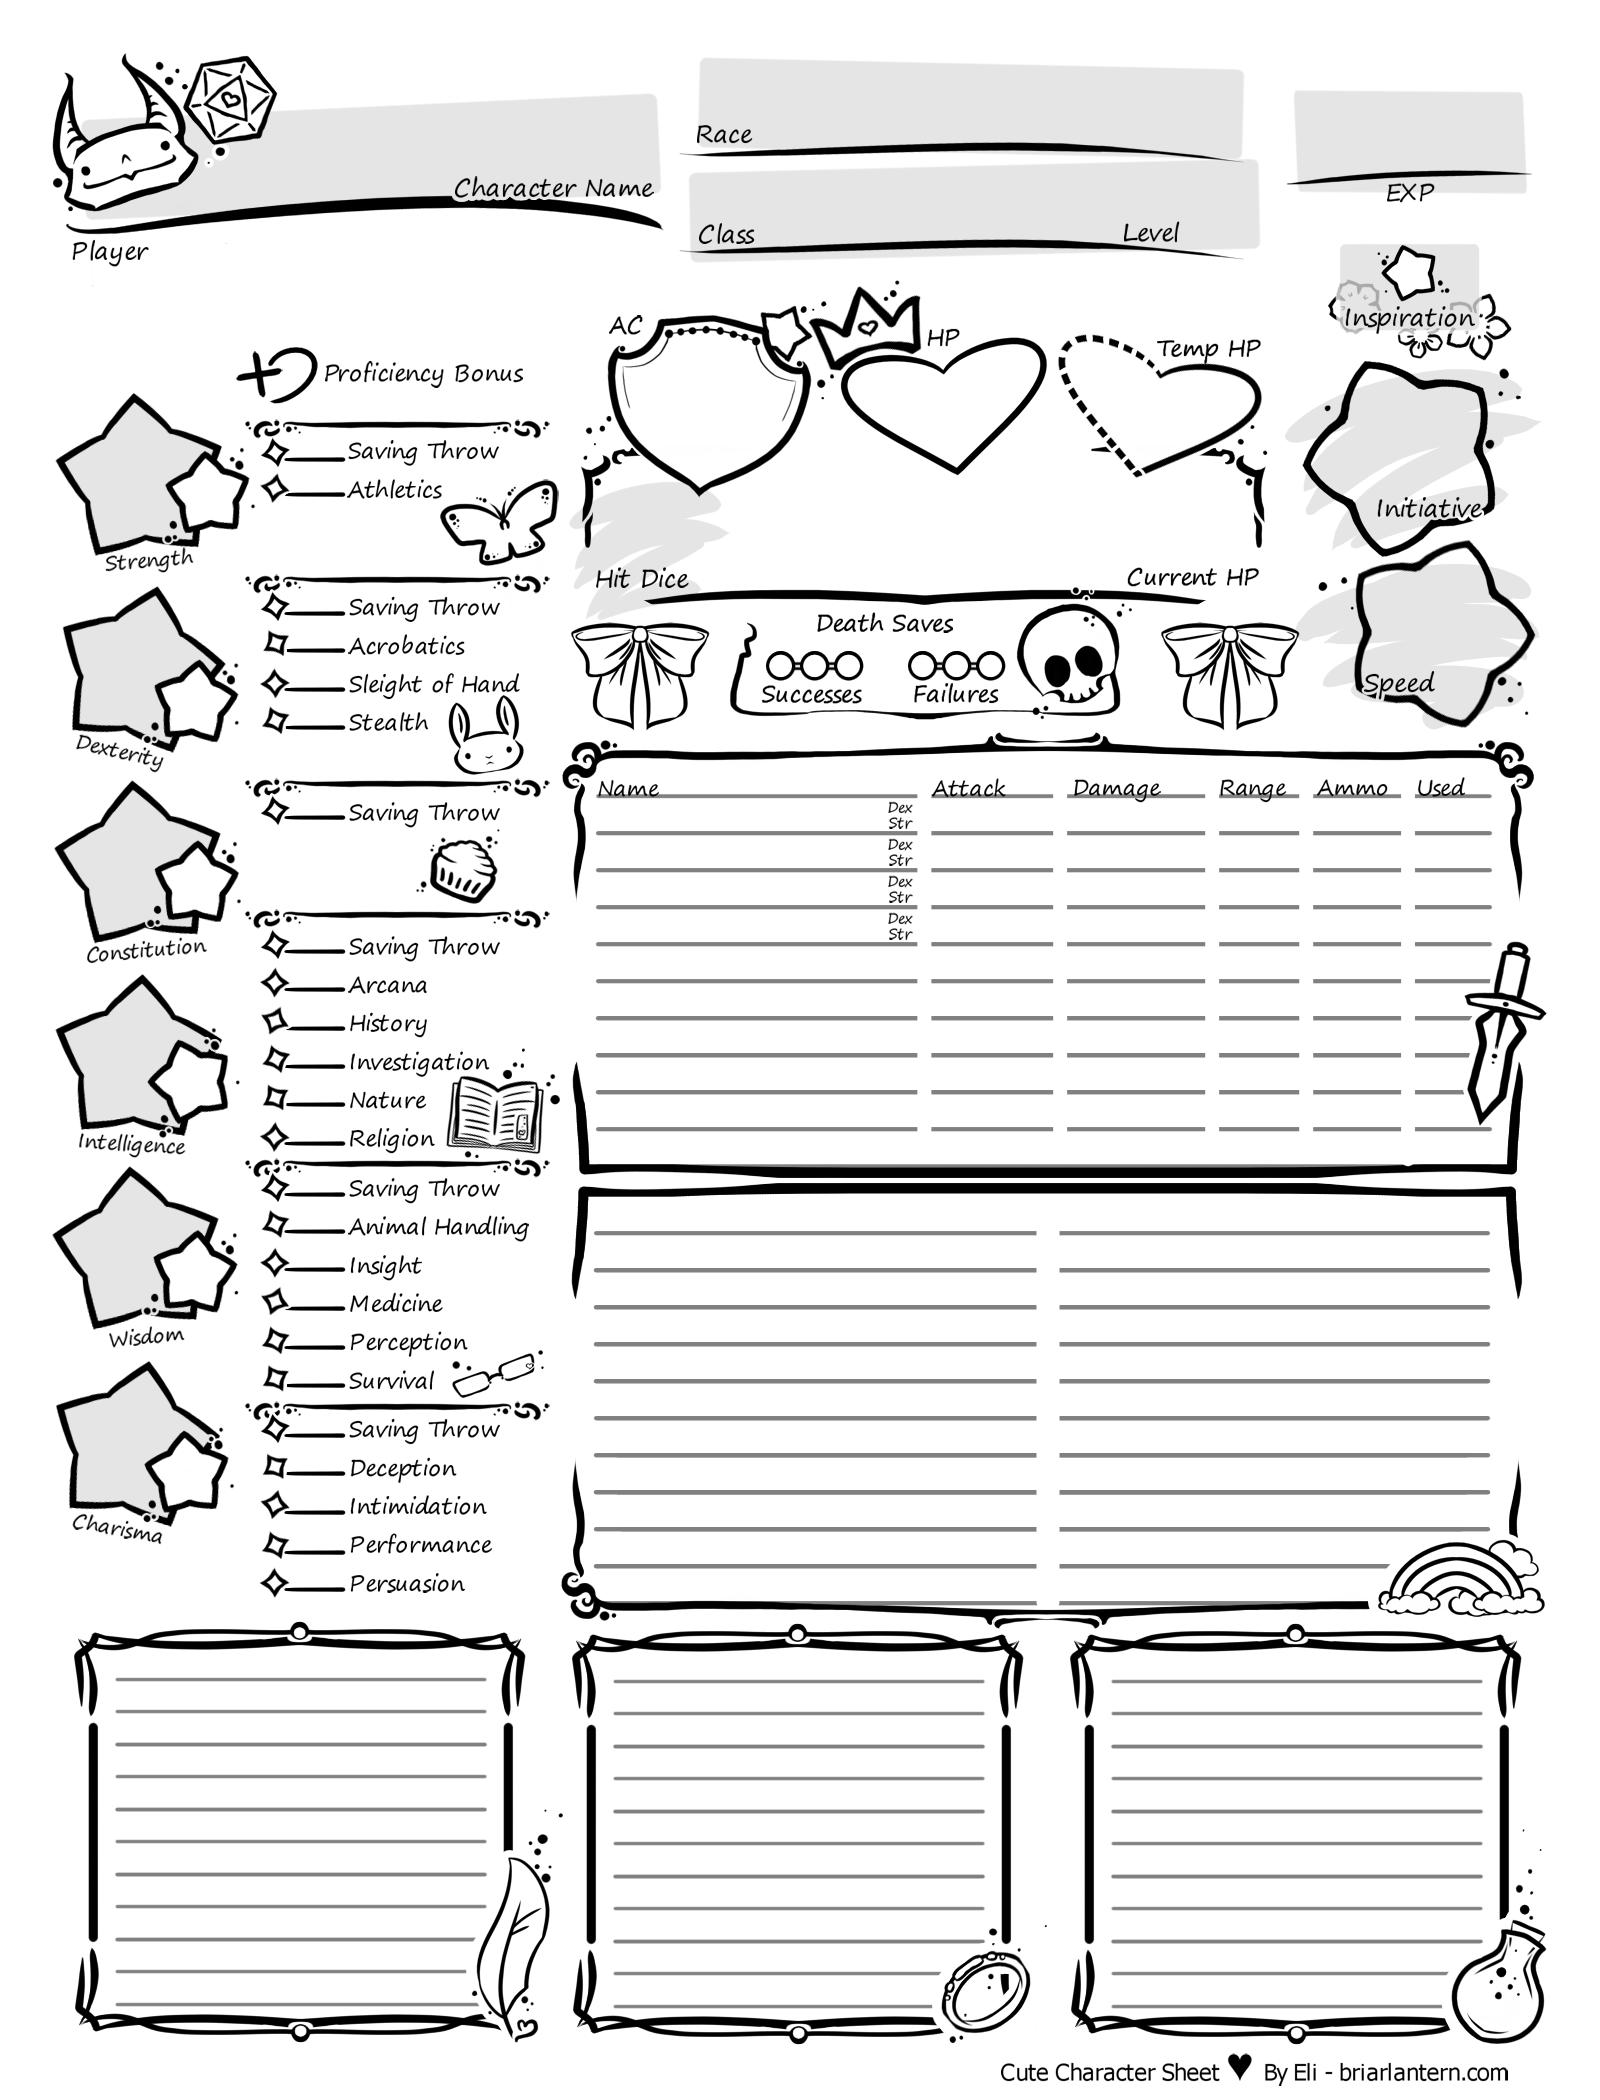 Dnd Character Sheet Pdf 5e